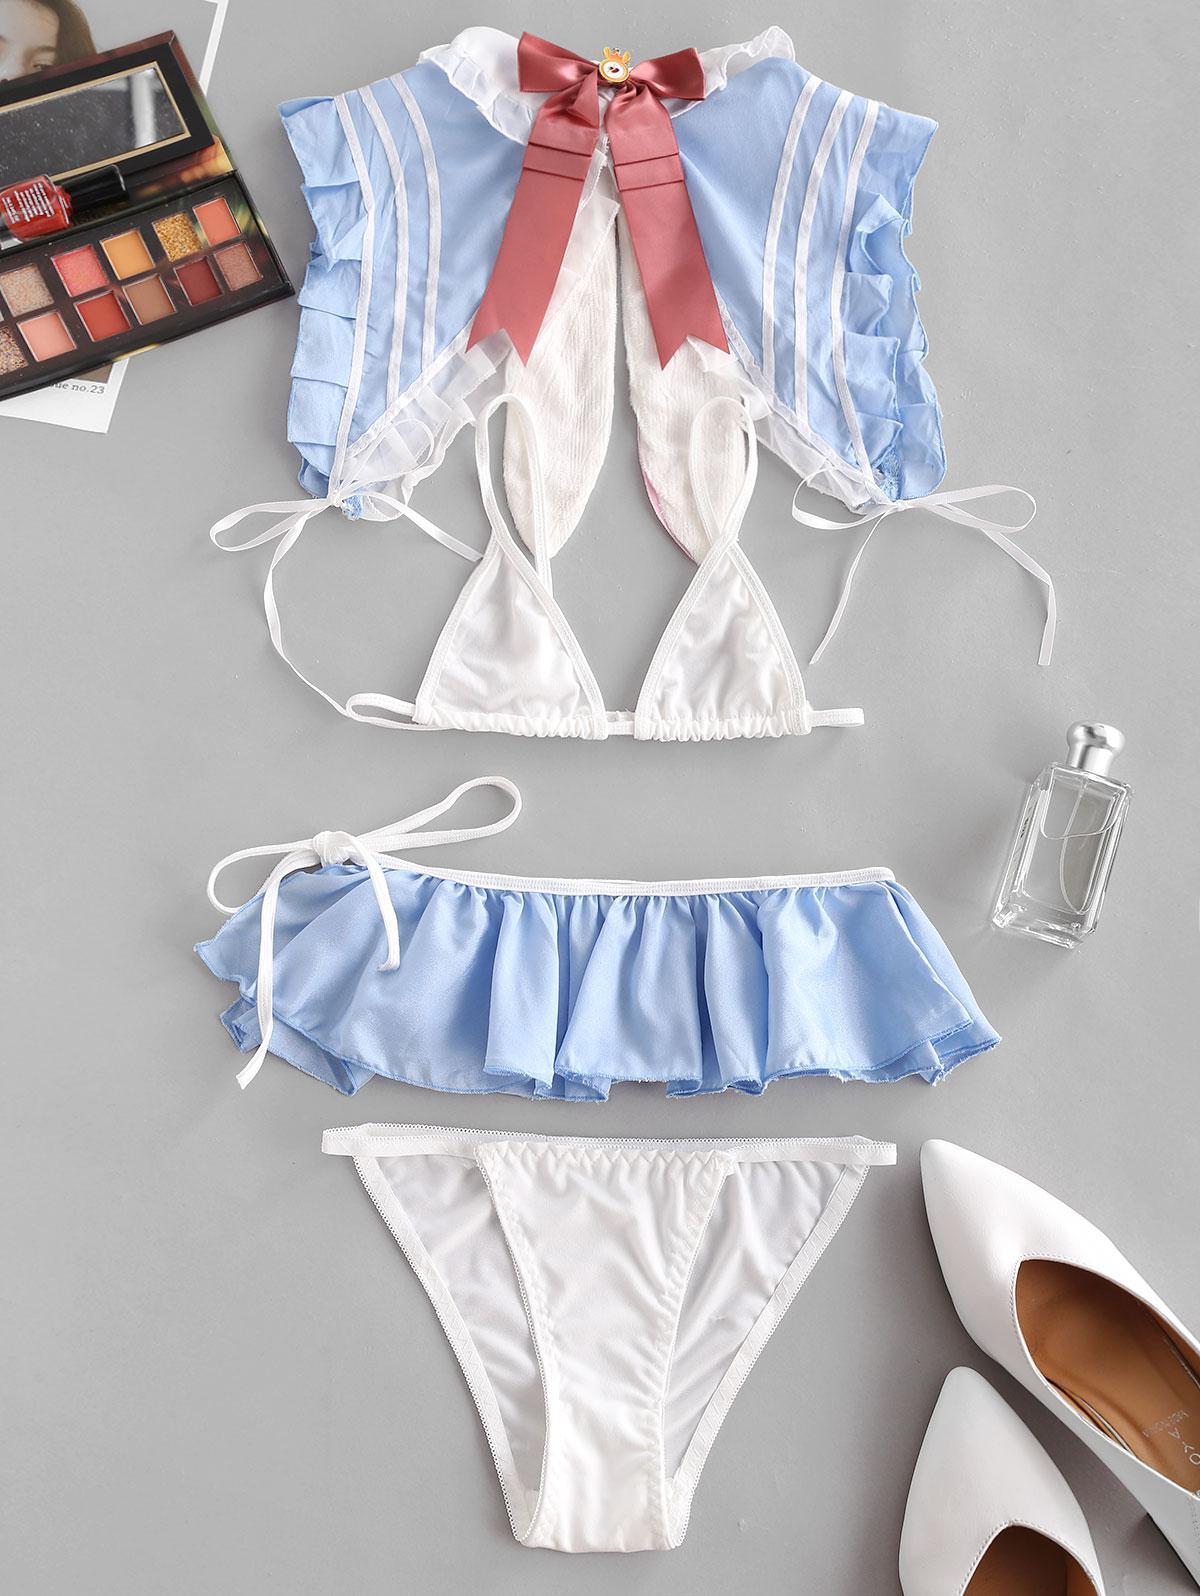 Ruffled Tie Side Lingerie Costume Set